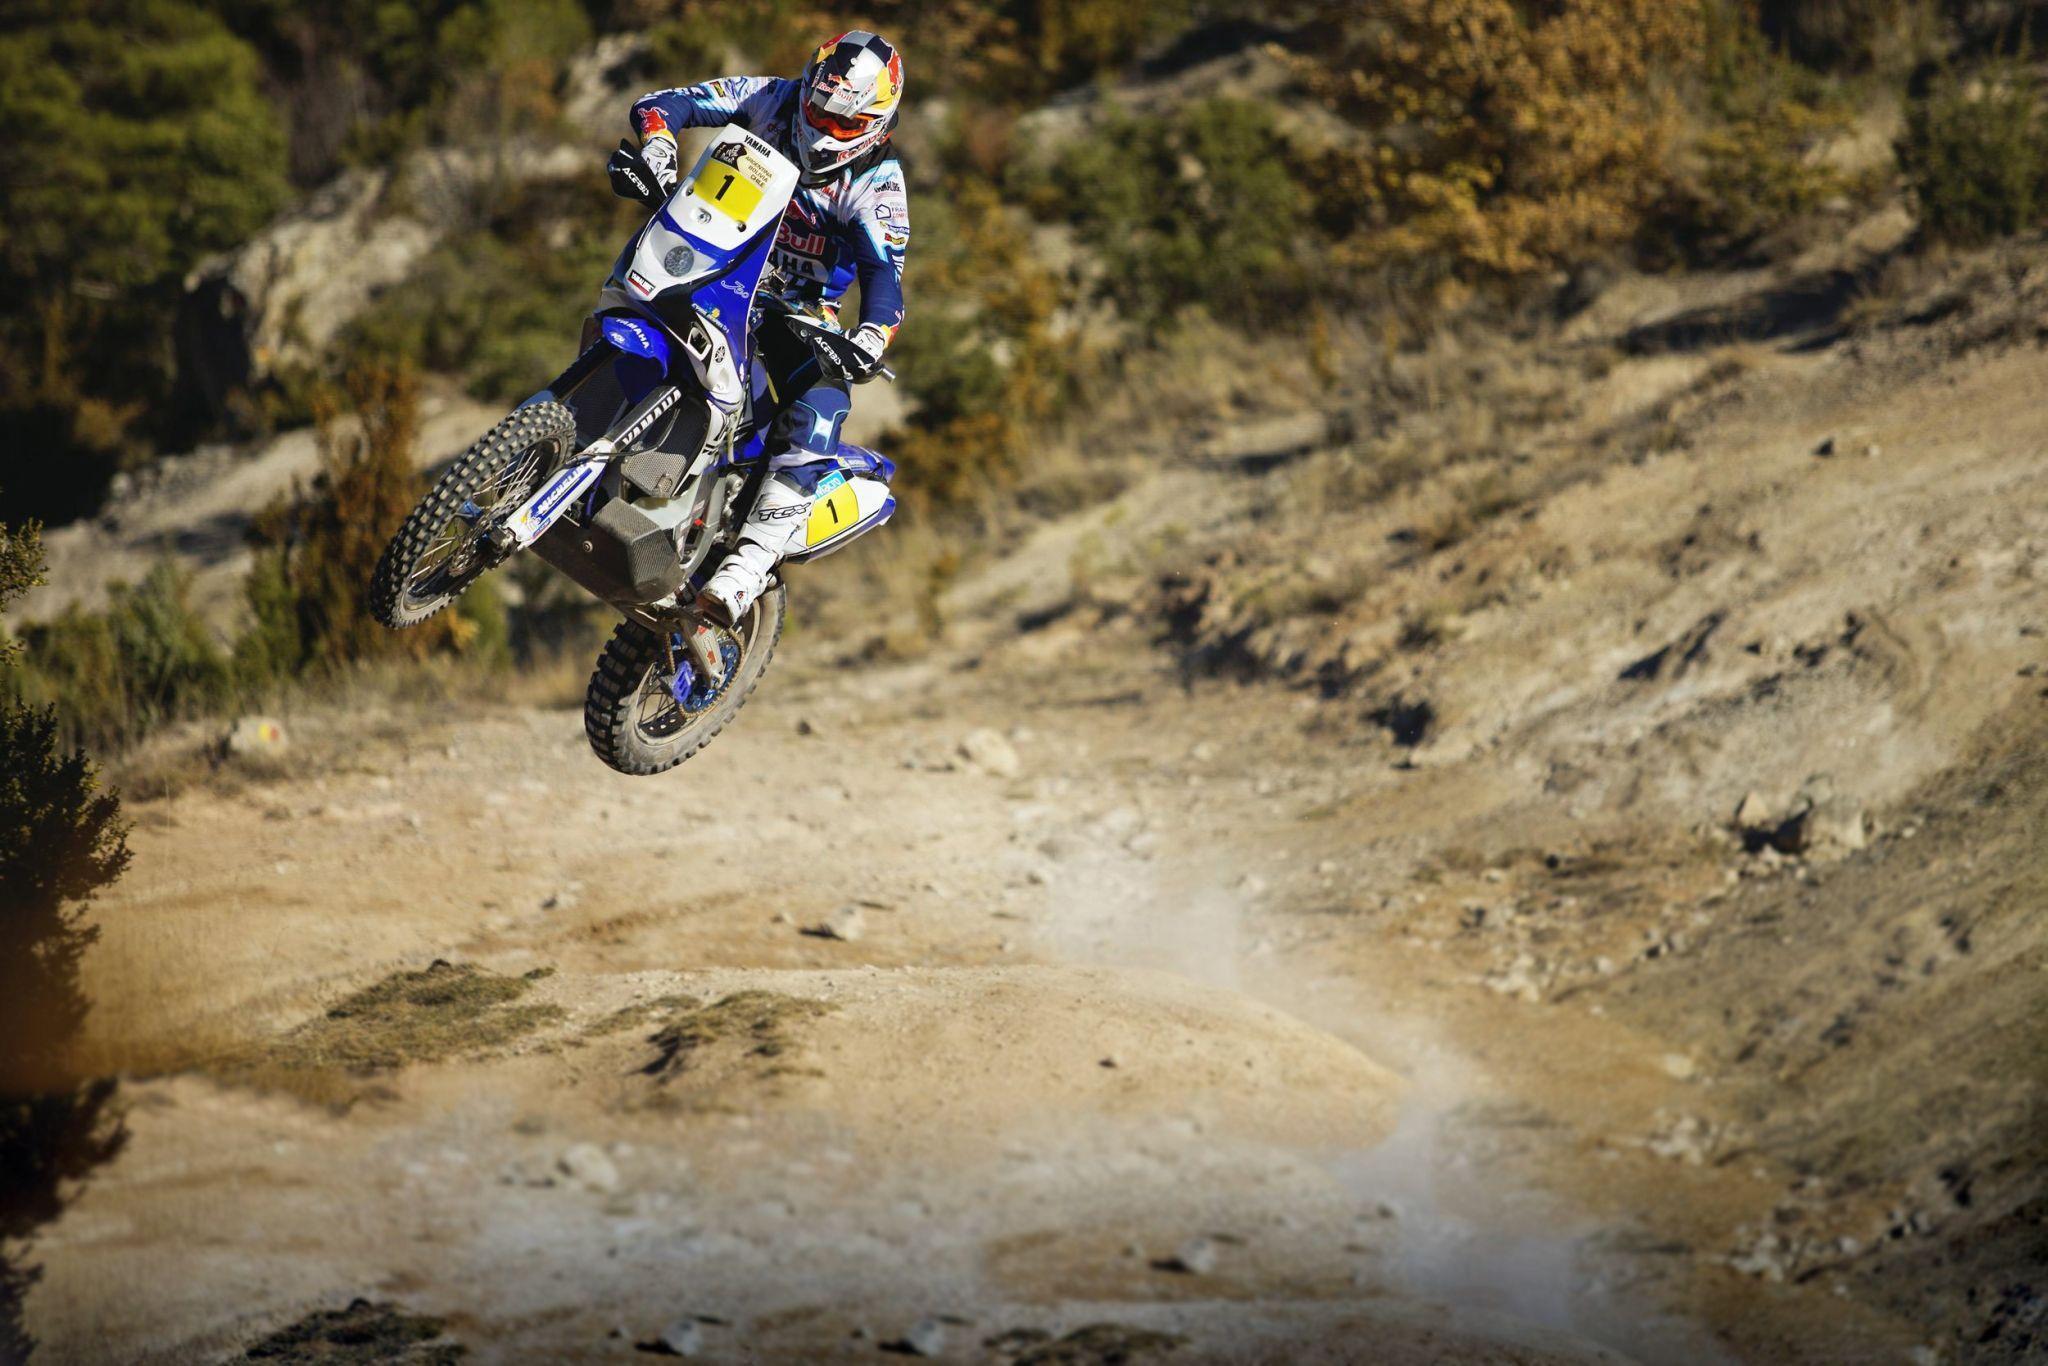 Cyril Despres Yamaha YZ450F Dakar Rally 2014 Wallpaper Wide or HD ...